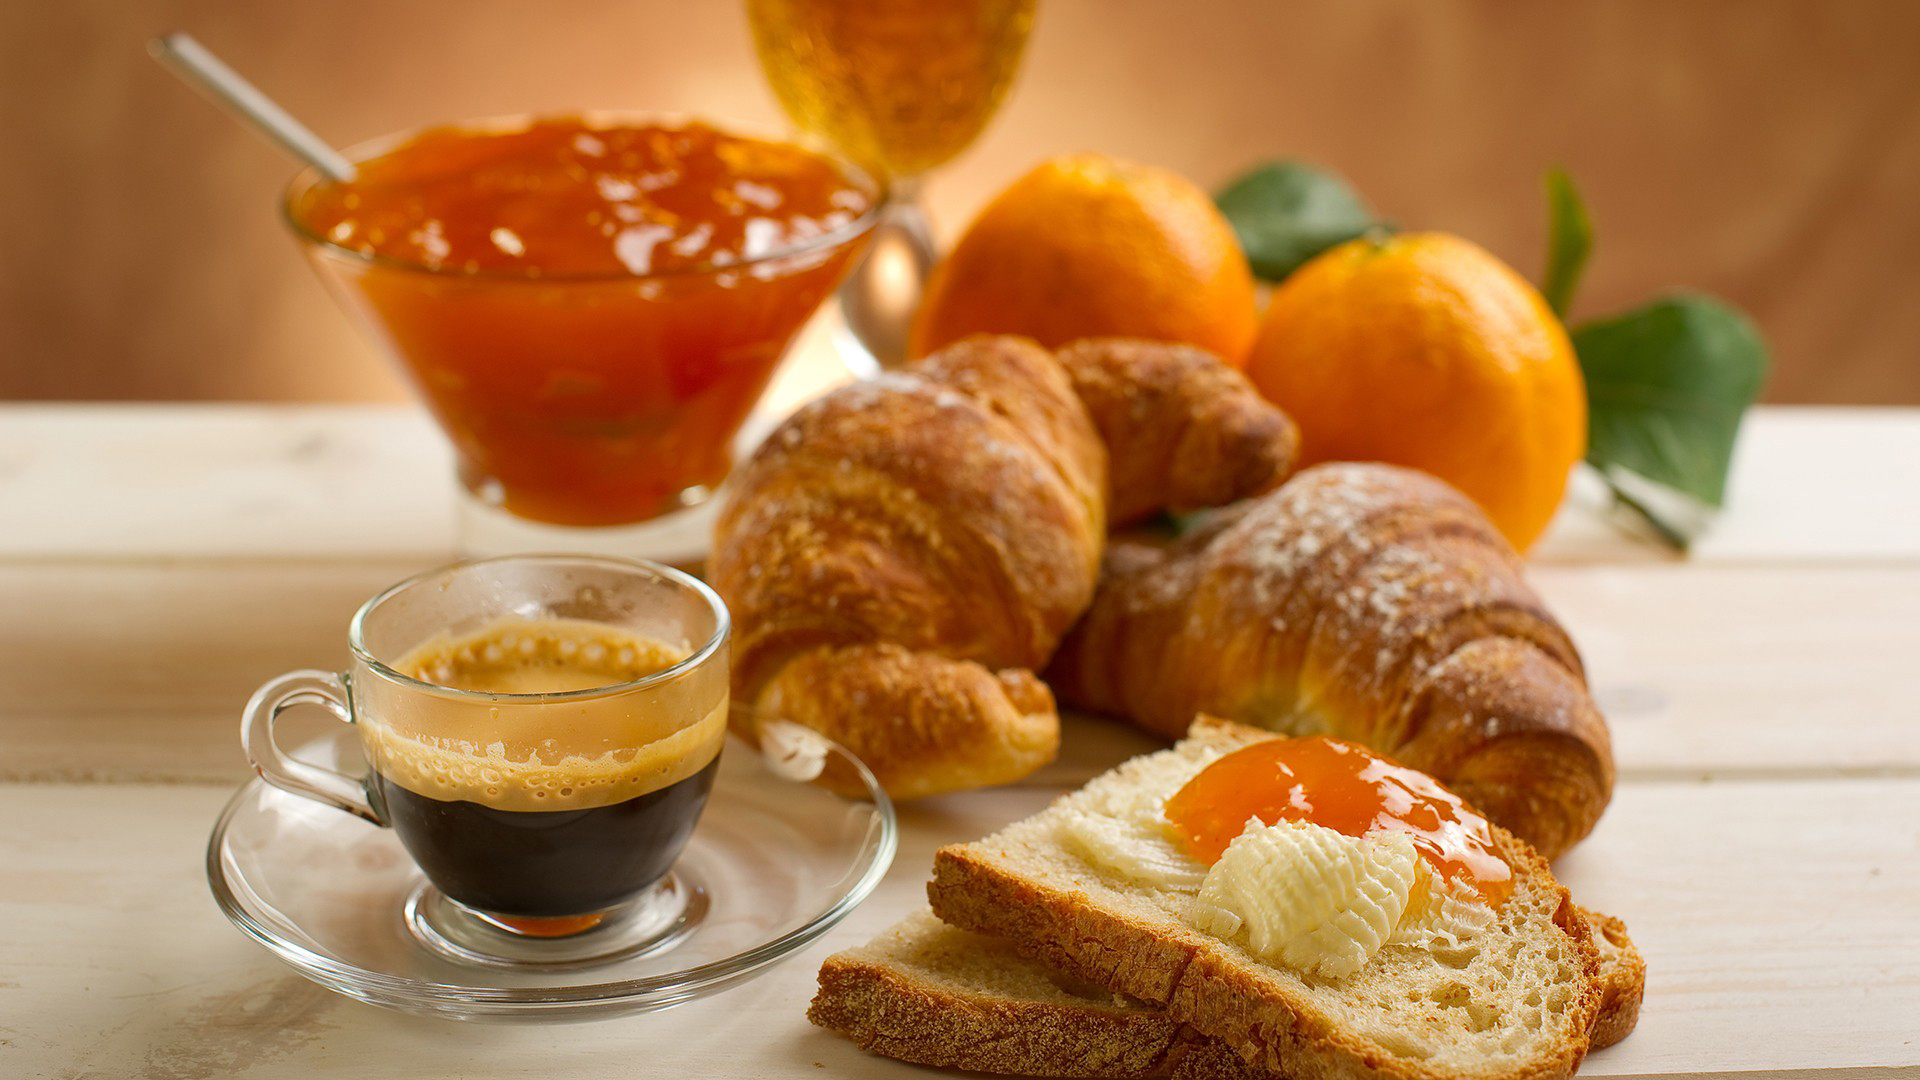 HD Wallpaper   Background ID:276902. 1920x1080 Food Breakfast